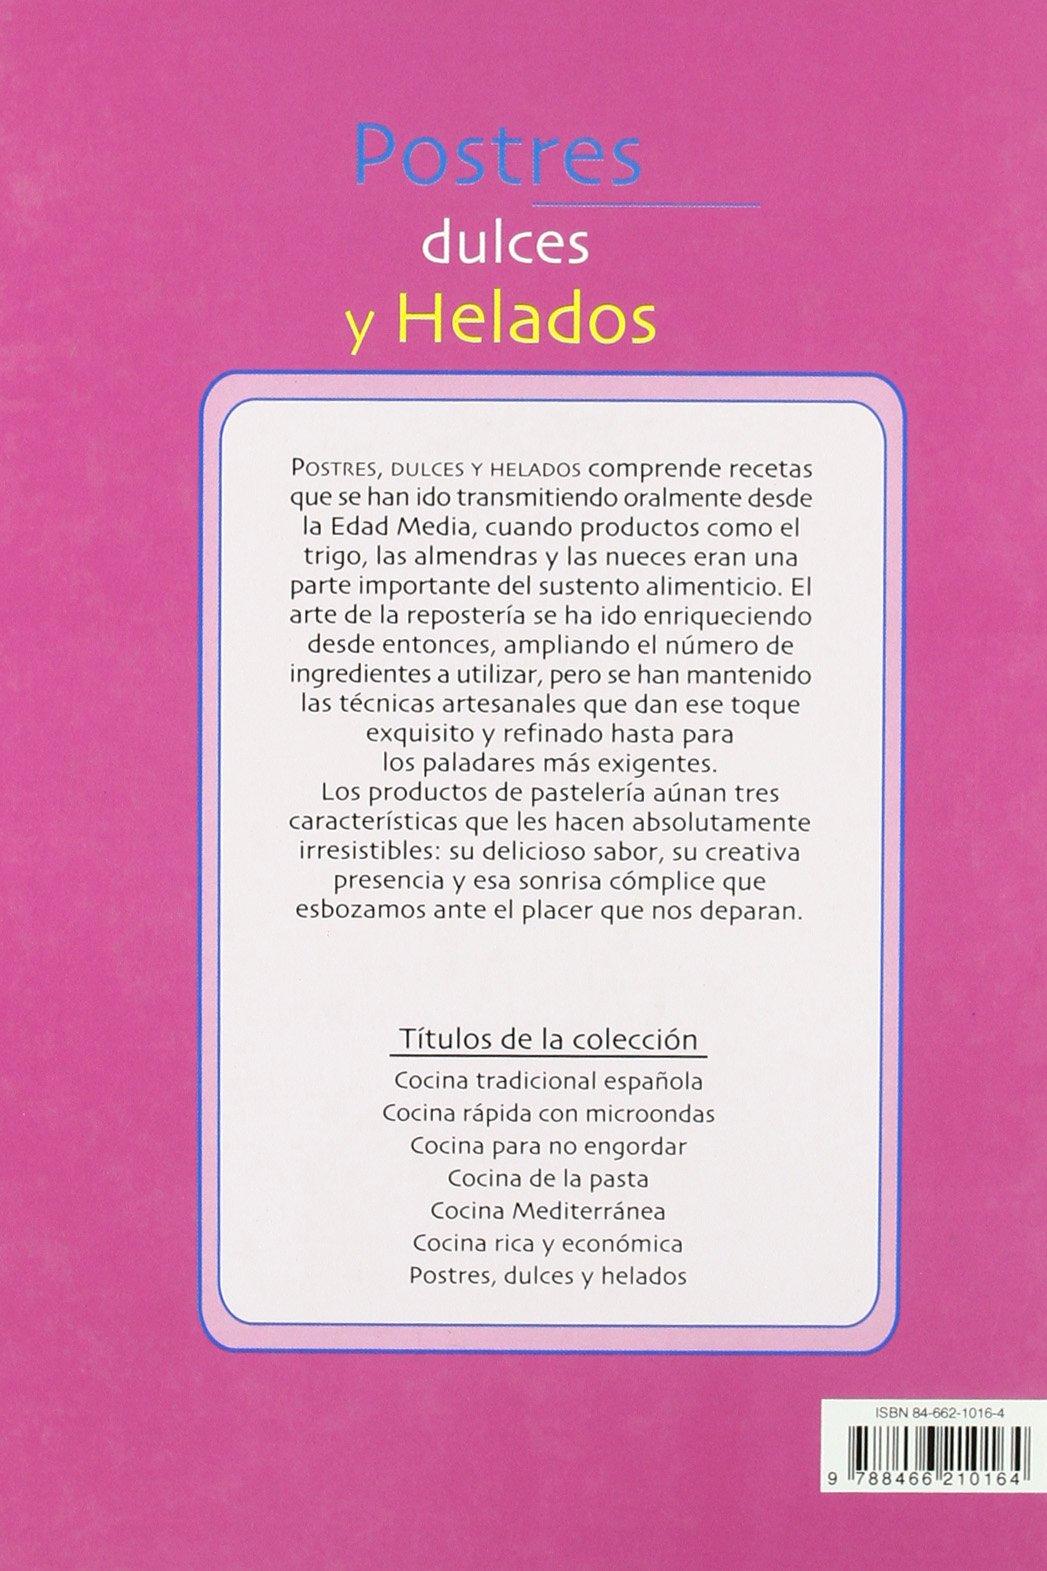 Postres, dulces y helados: GLORIA SANJUAN: 9788466210164: Amazon.com: Books